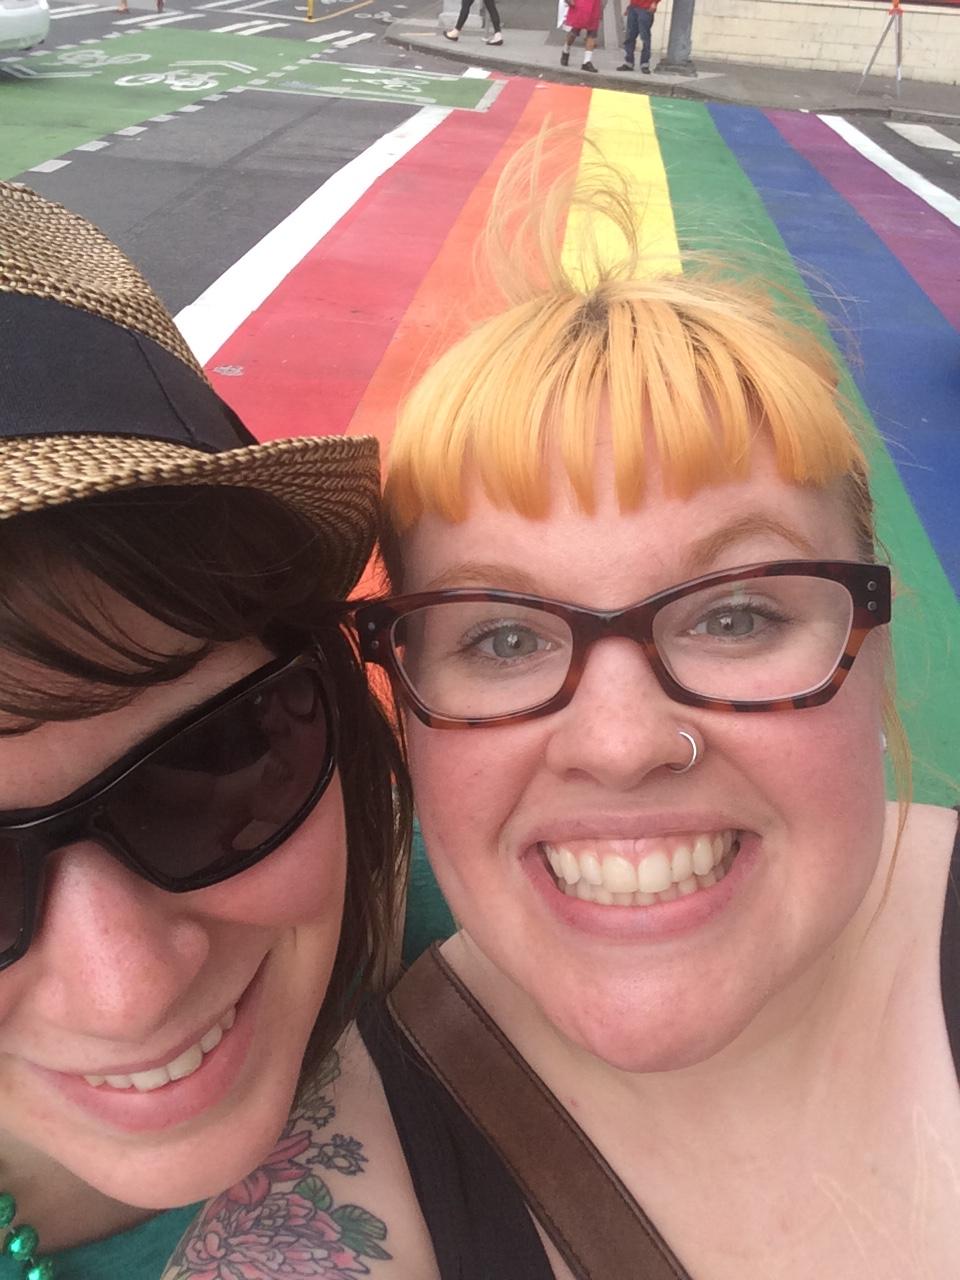 Selfie with Capitol Hill's rainbow sidewalks